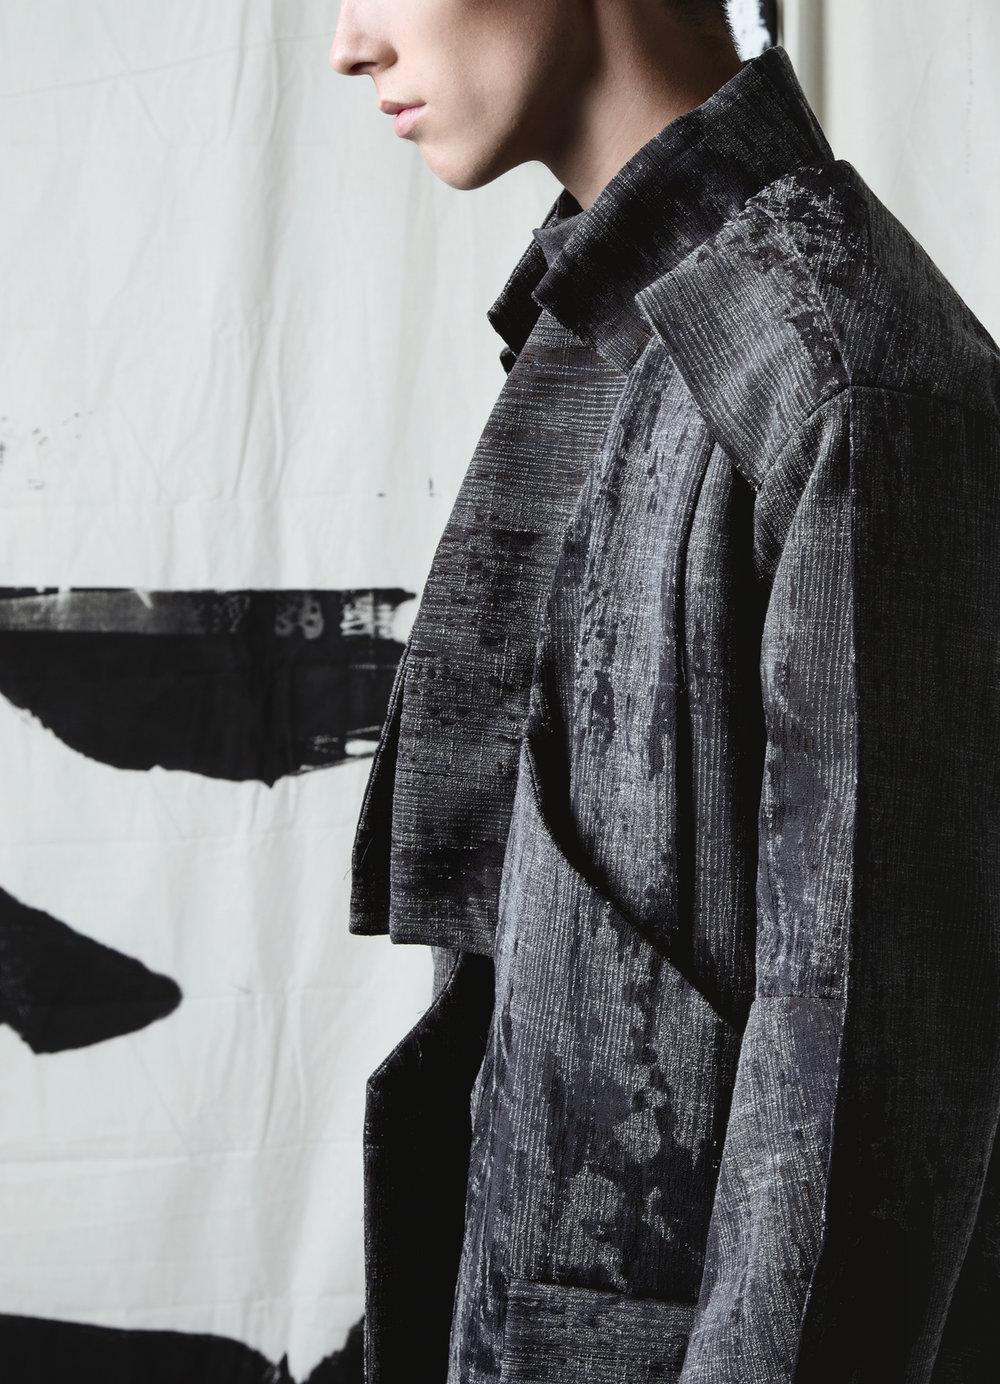 Mark Kazu Mekaru, MFA Fashion Design, Katy Fang Liu, MFA Textile Design, and Amo (Yu Ling) Chou, MFA Knitwear Design.